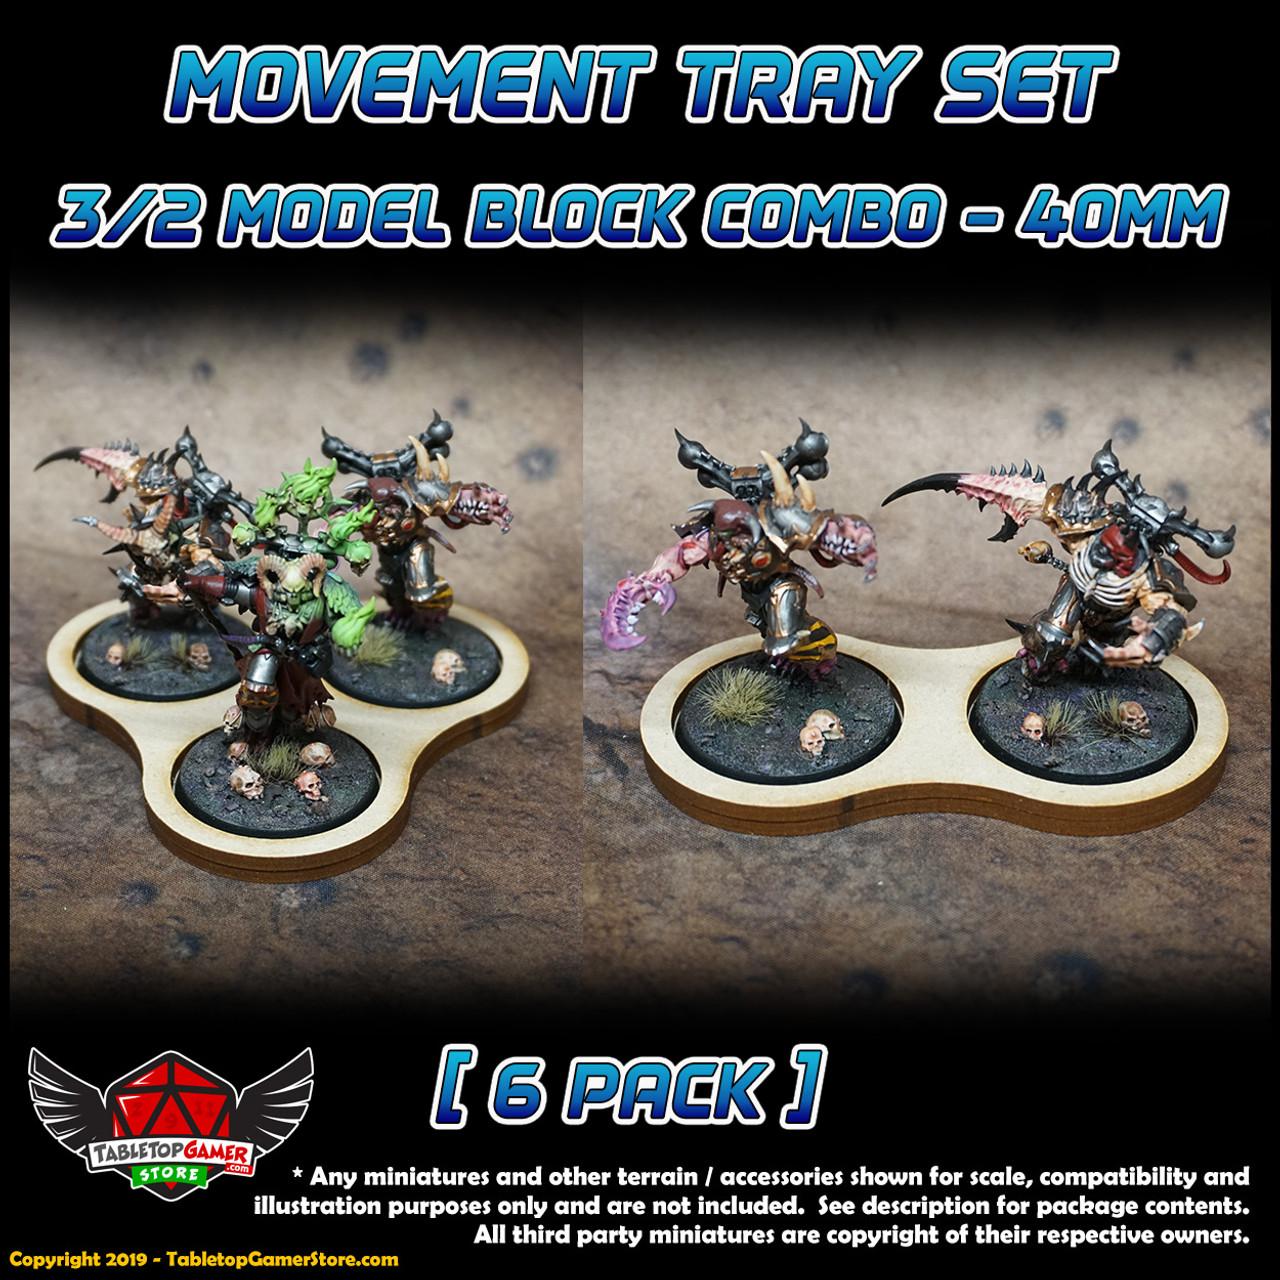 40mm Movement Tray Set - 3/2 Model Block Combo - 6 Pack